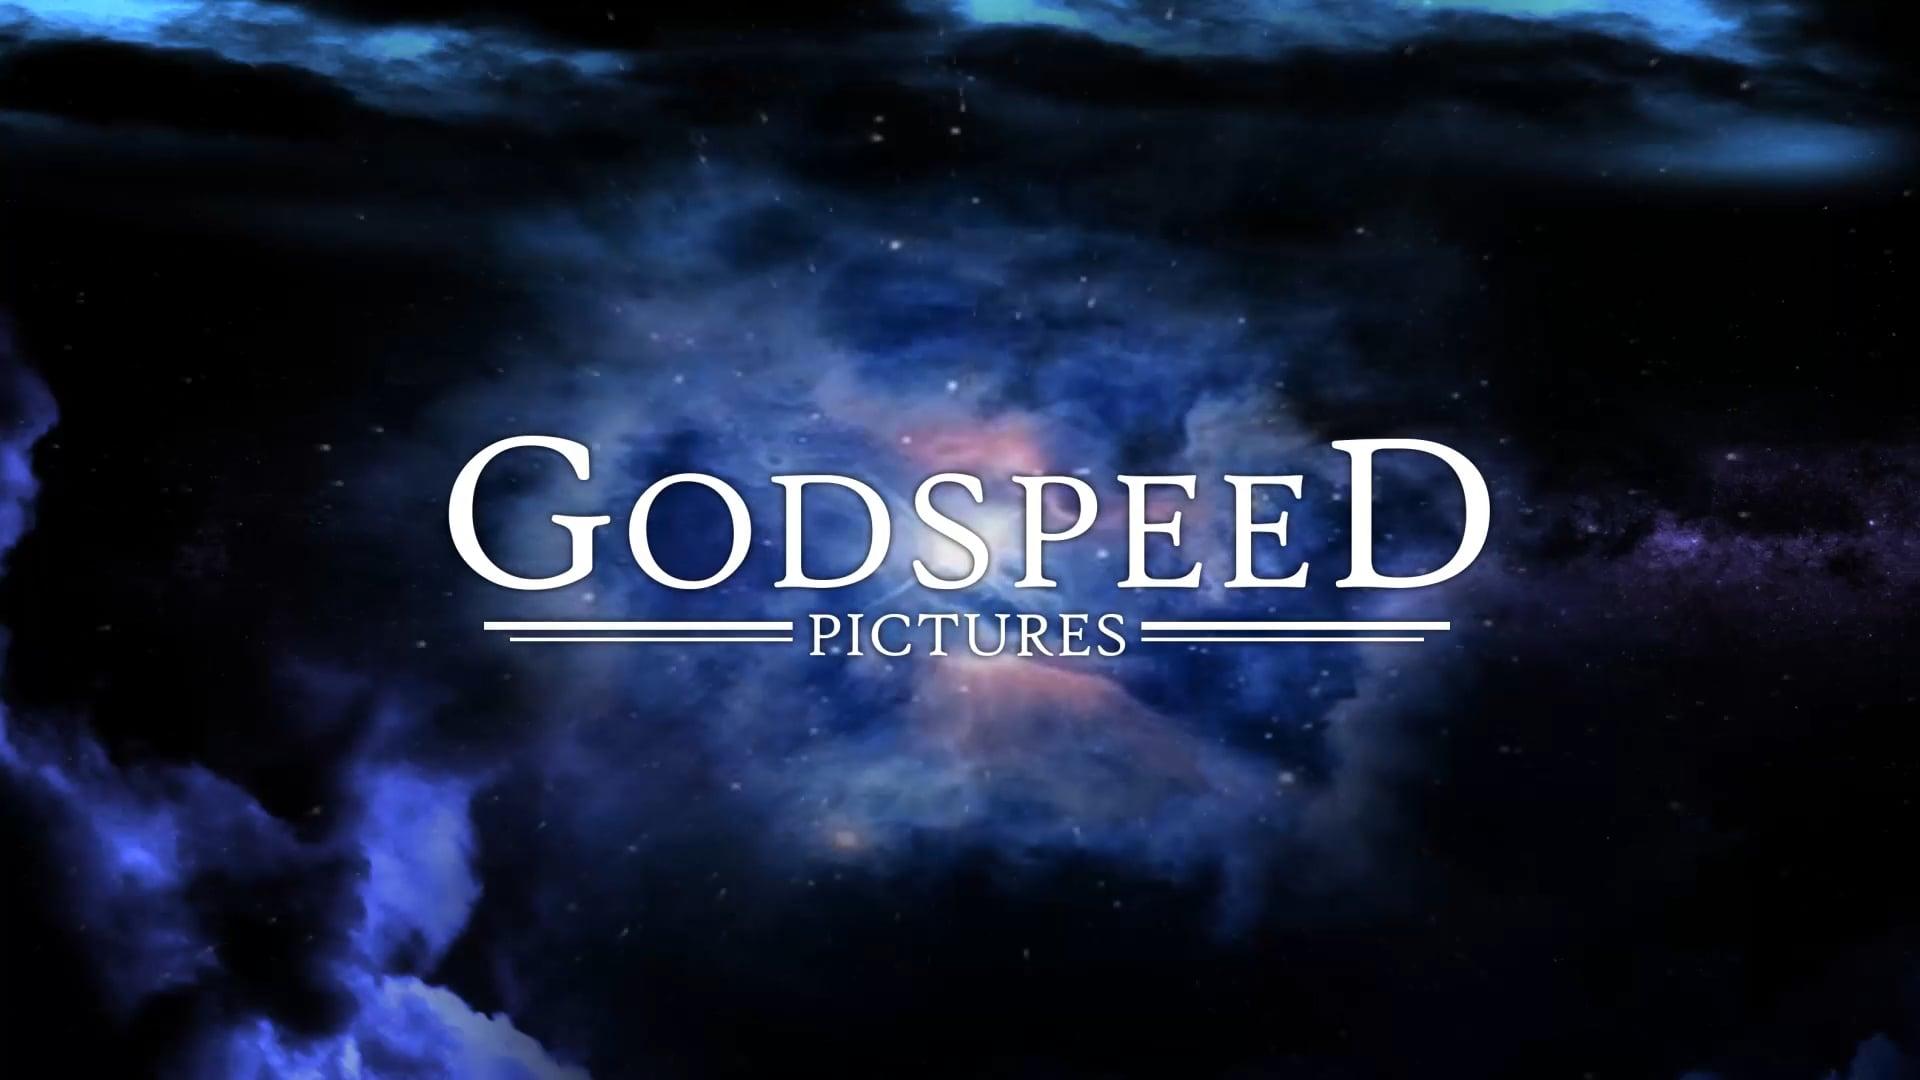 Godspeed Pictures Motion Logo